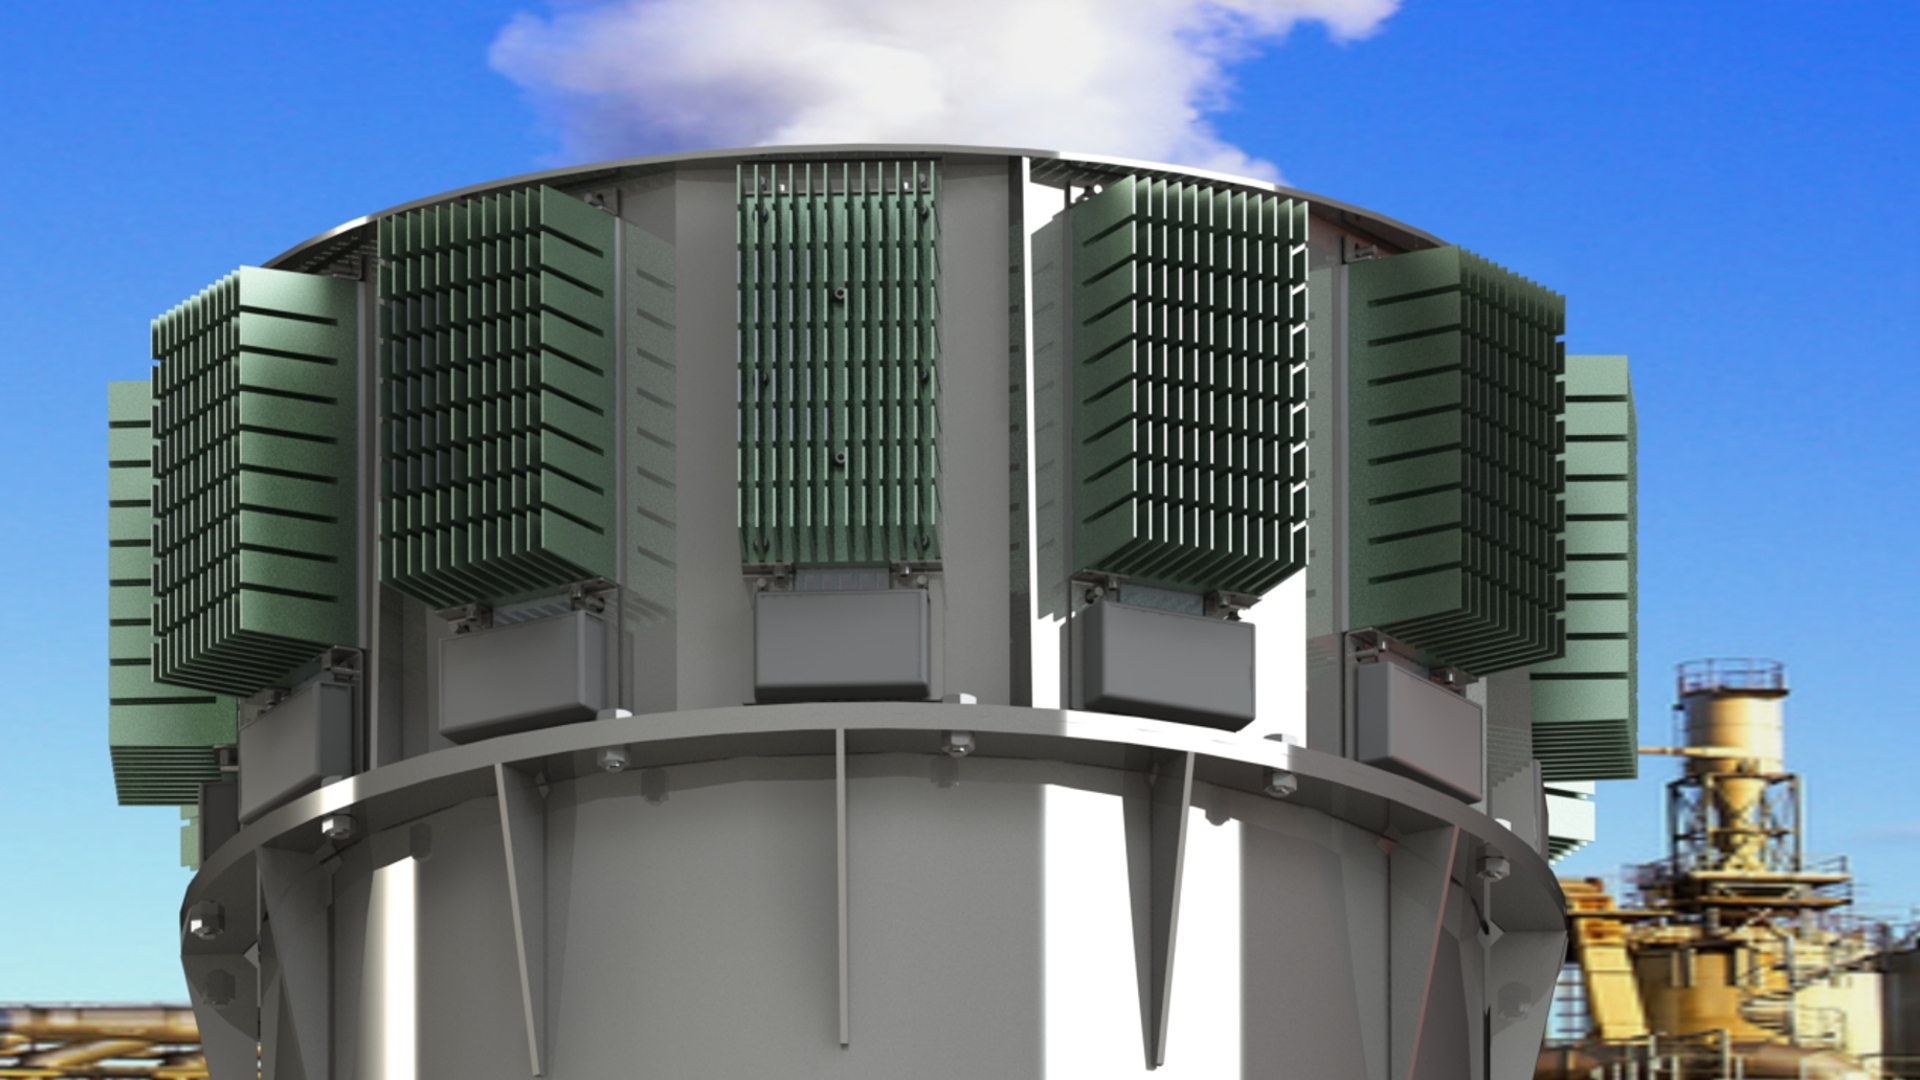 AEInnova: Energy harvester to generate €10 million revenue, plans Series A